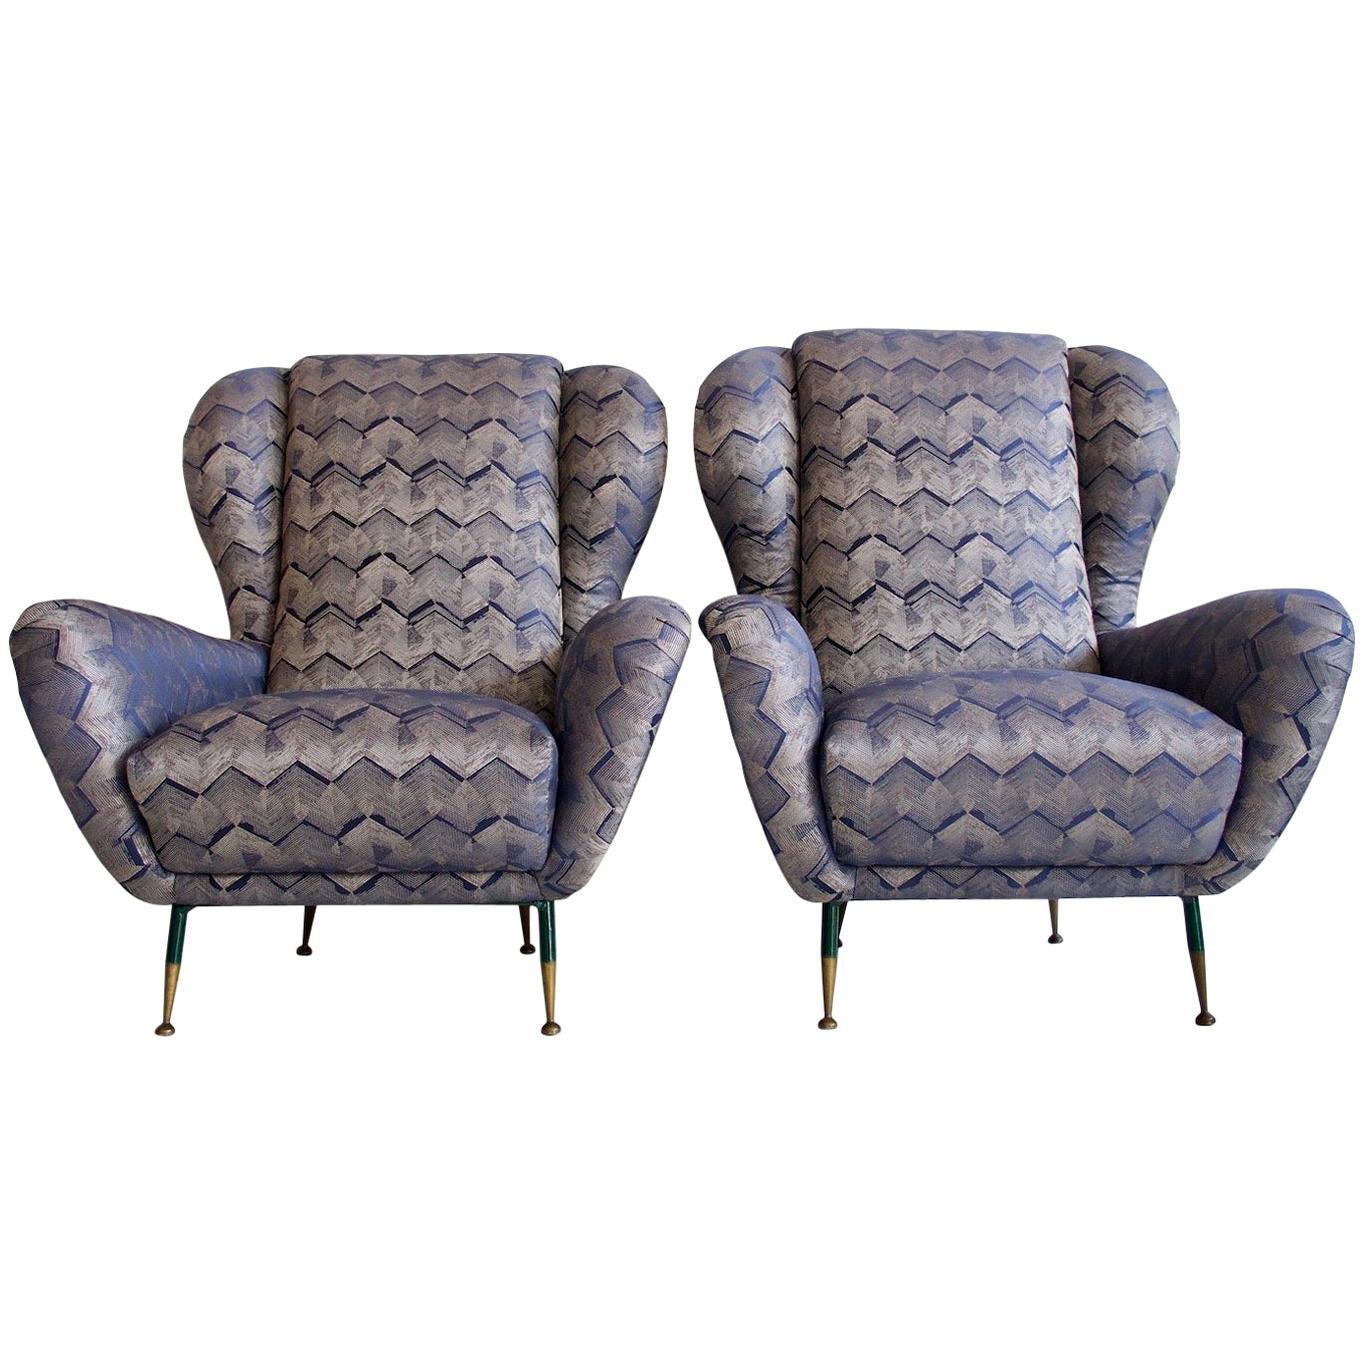 Pair of Italian Armchairs with Slim Brass Feet